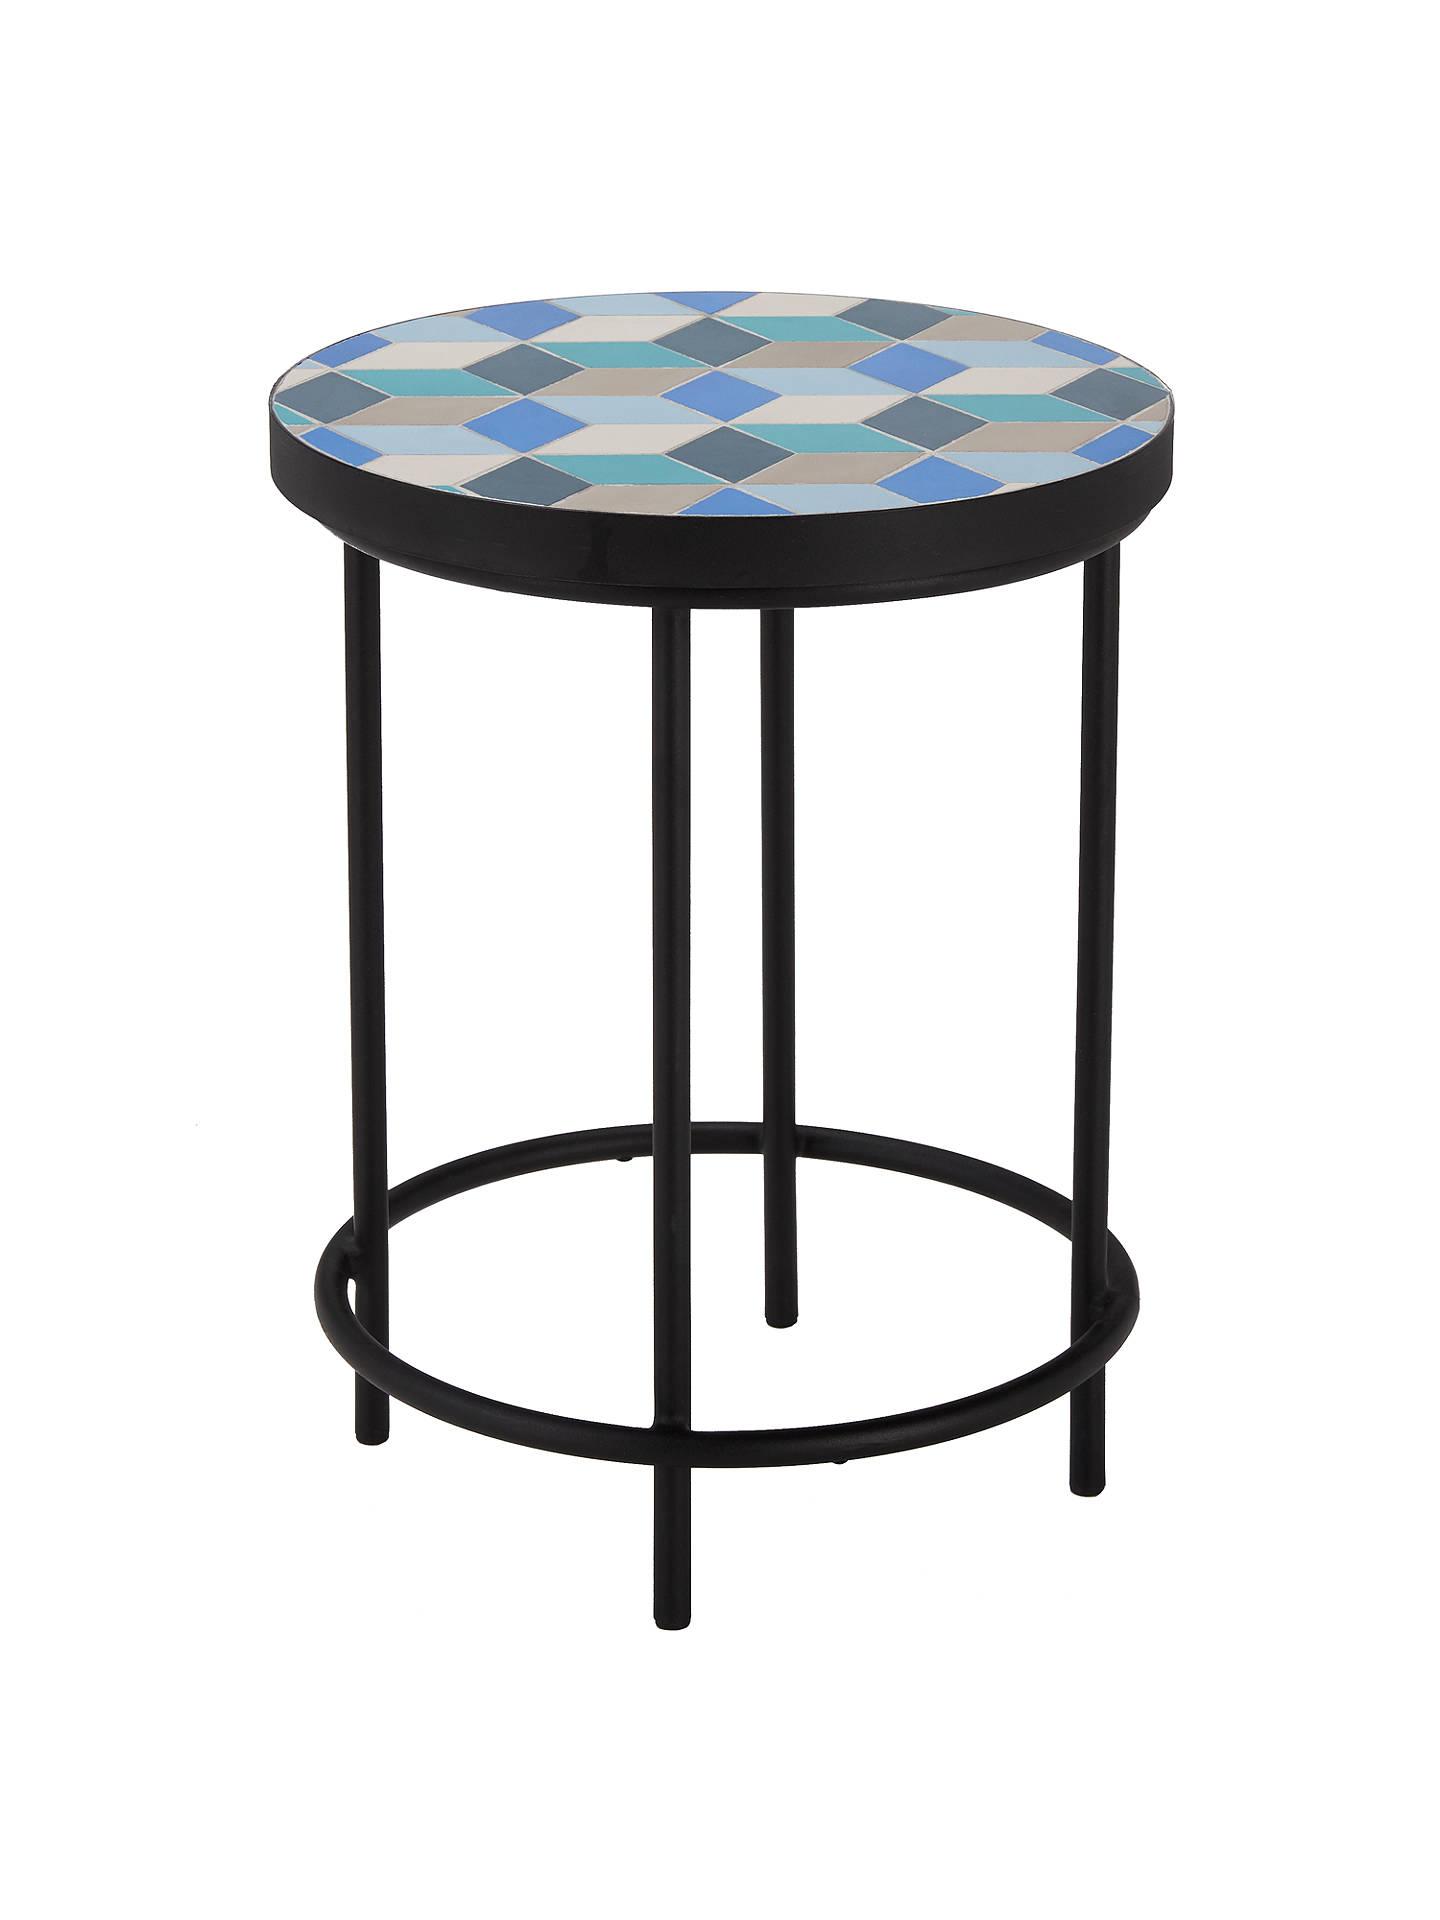 john lewis suri mosaic garden side table at john lewis. Black Bedroom Furniture Sets. Home Design Ideas